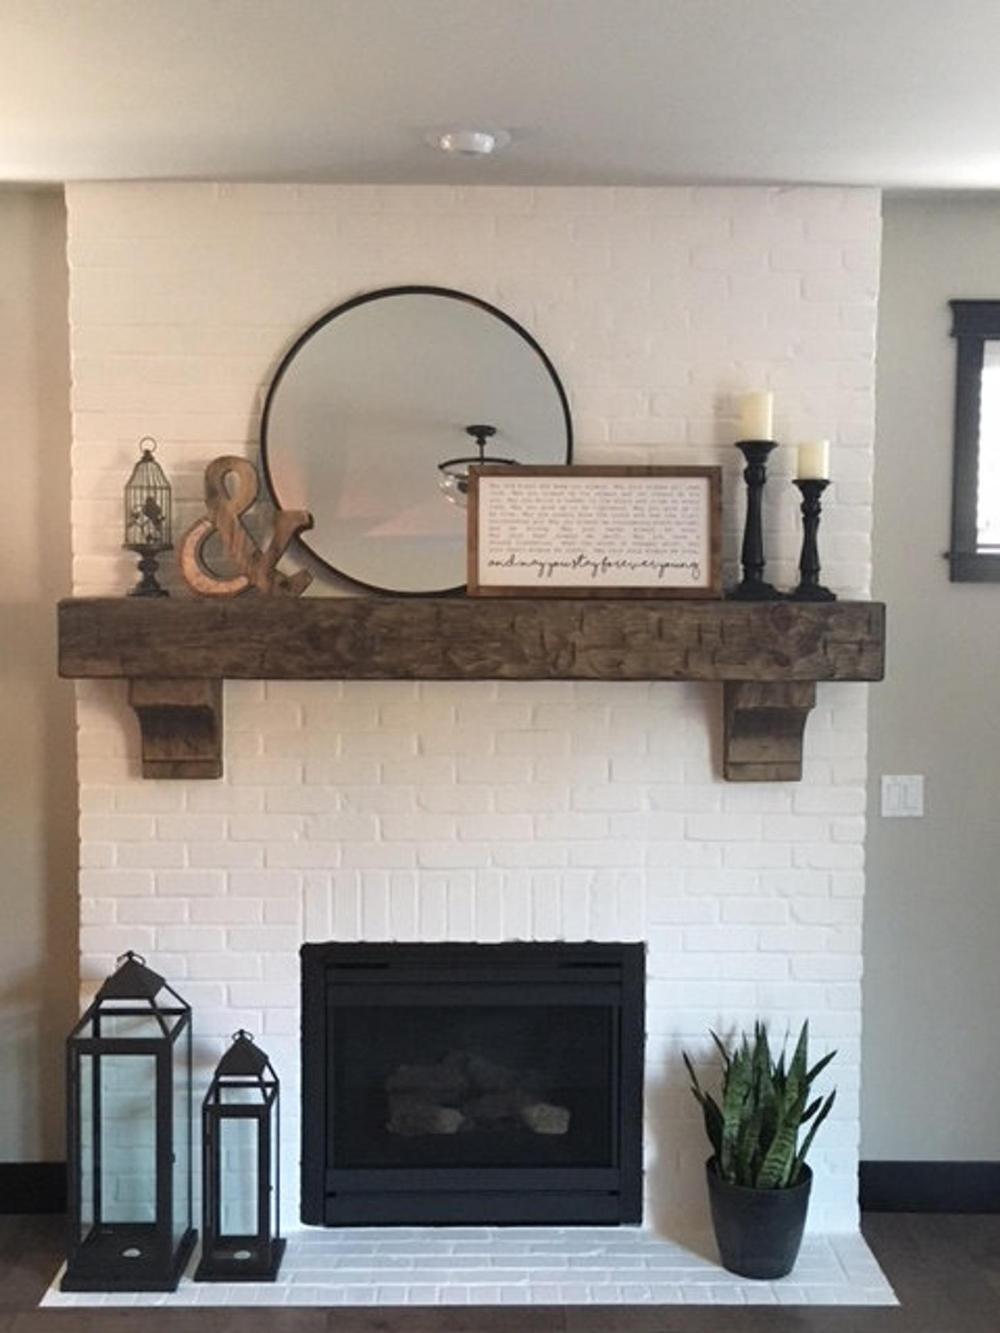 Fireplace Mantel 62 Custom Chunky Long Rustic 8 by 8 | Etsy